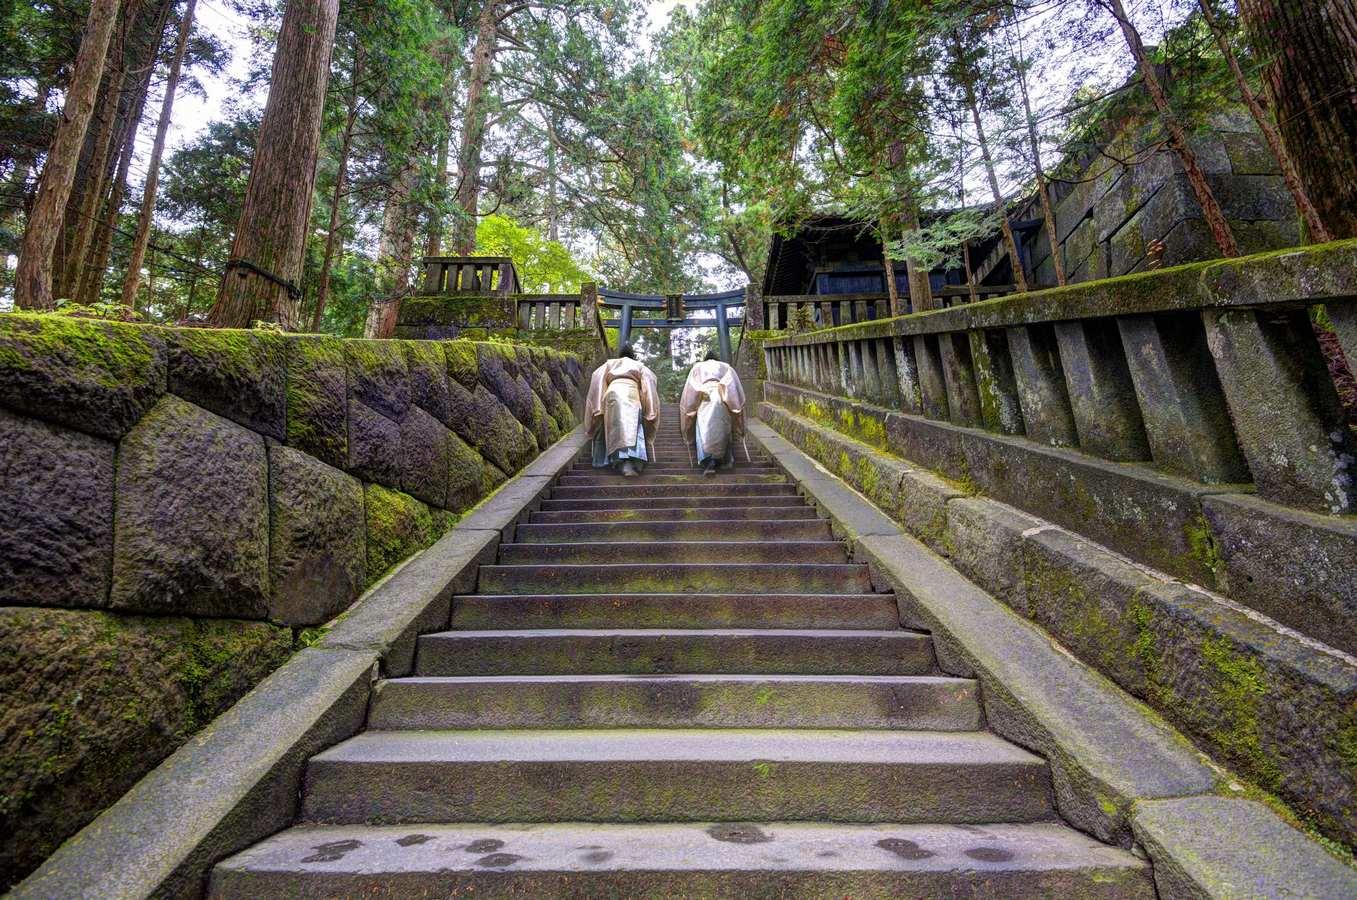 Climbing-the-steps-to-Ieyasus-shrine-а.jpg